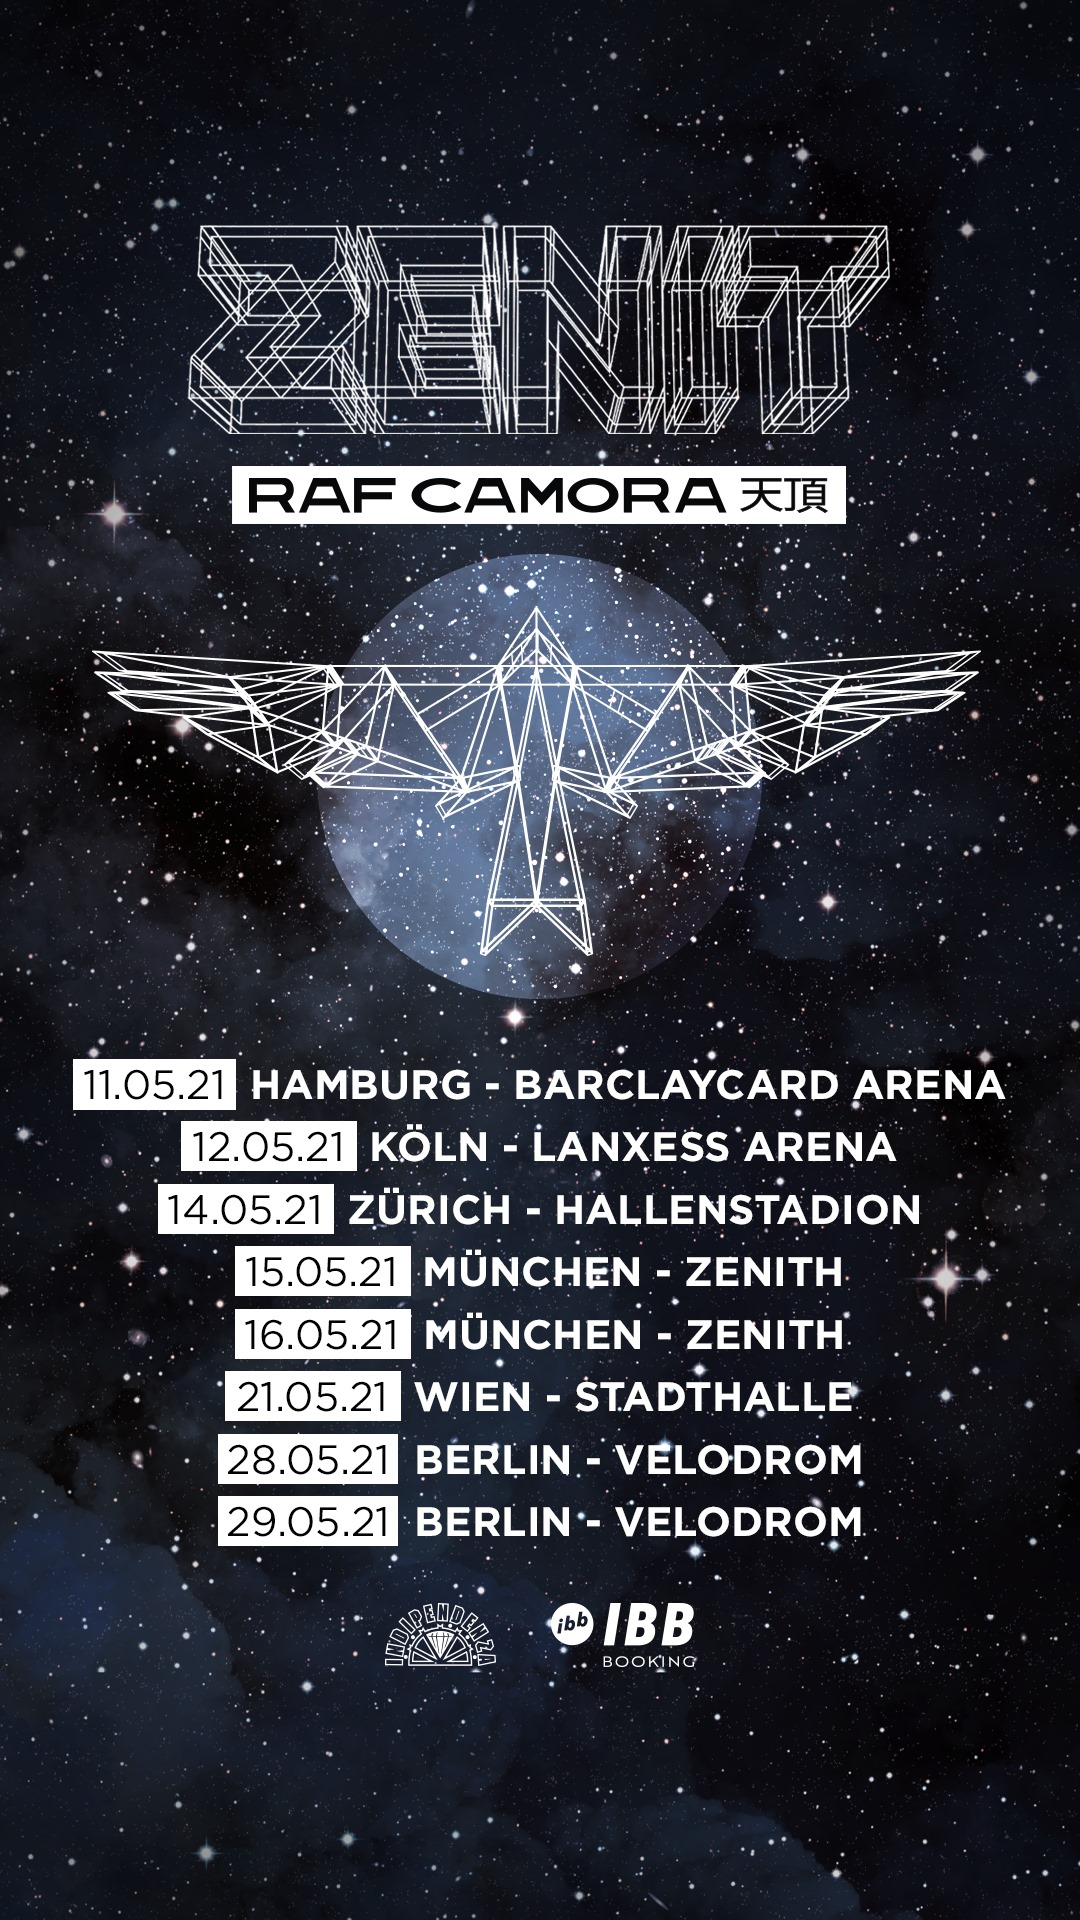 RAF Camora am 8. October 2020 @ Wiener Stadthalle - Halle D.